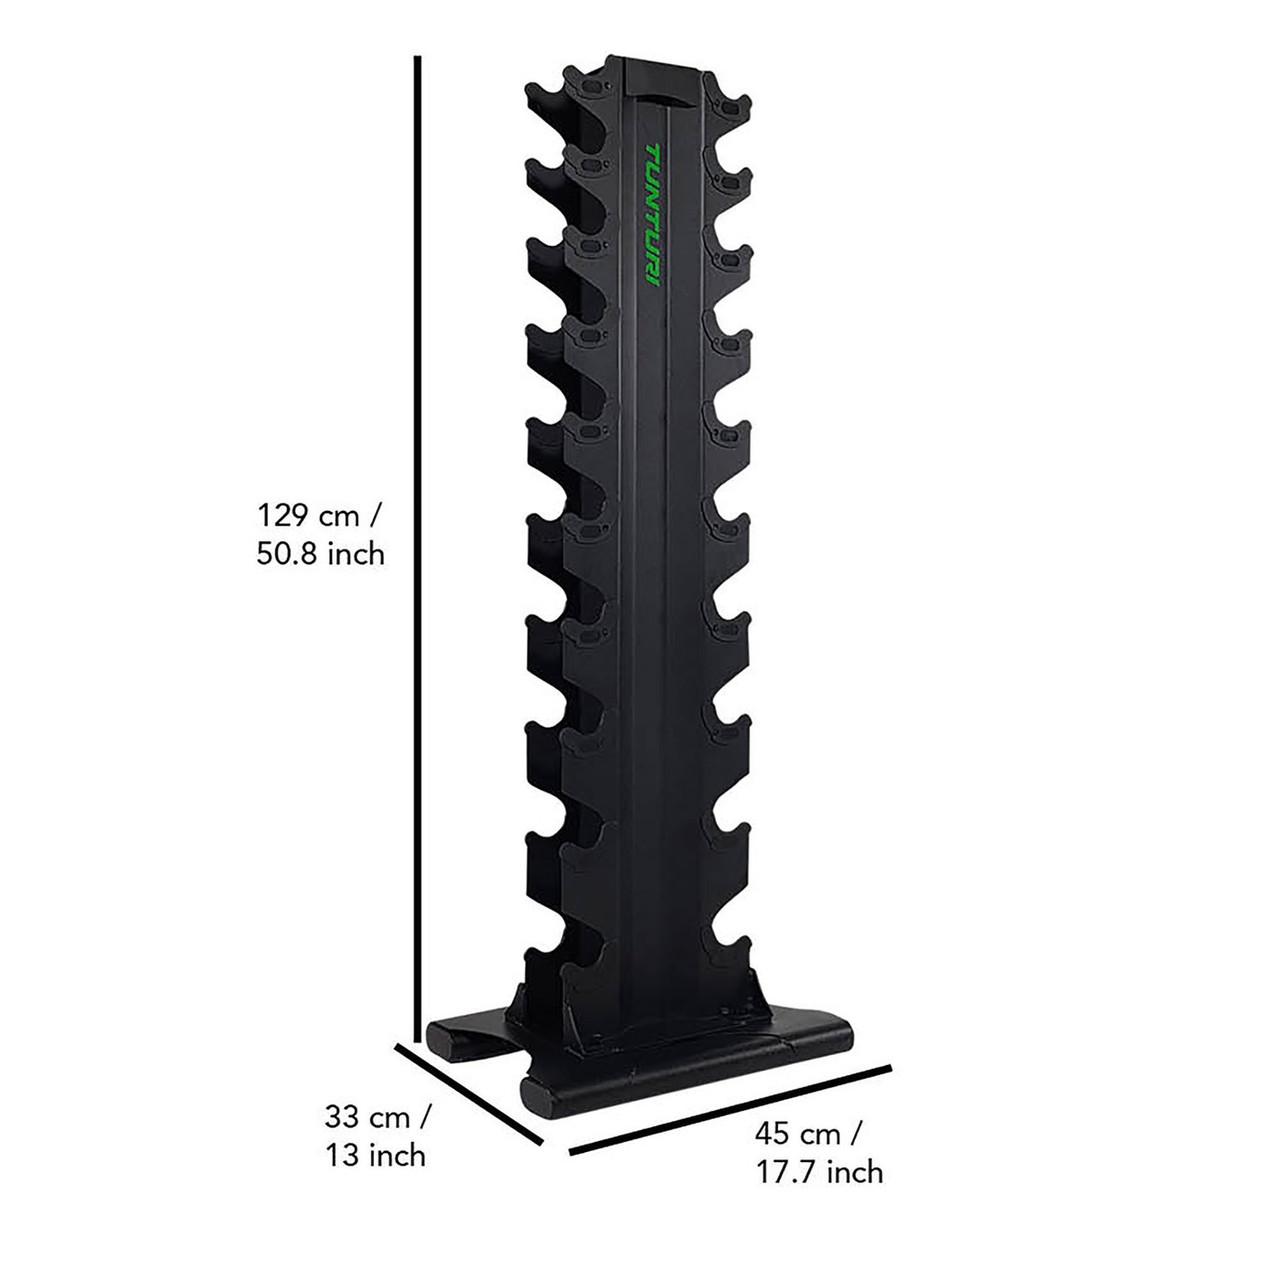 Стойка для гантелей Tunturi Pro Dumbbell Tower - фото 2